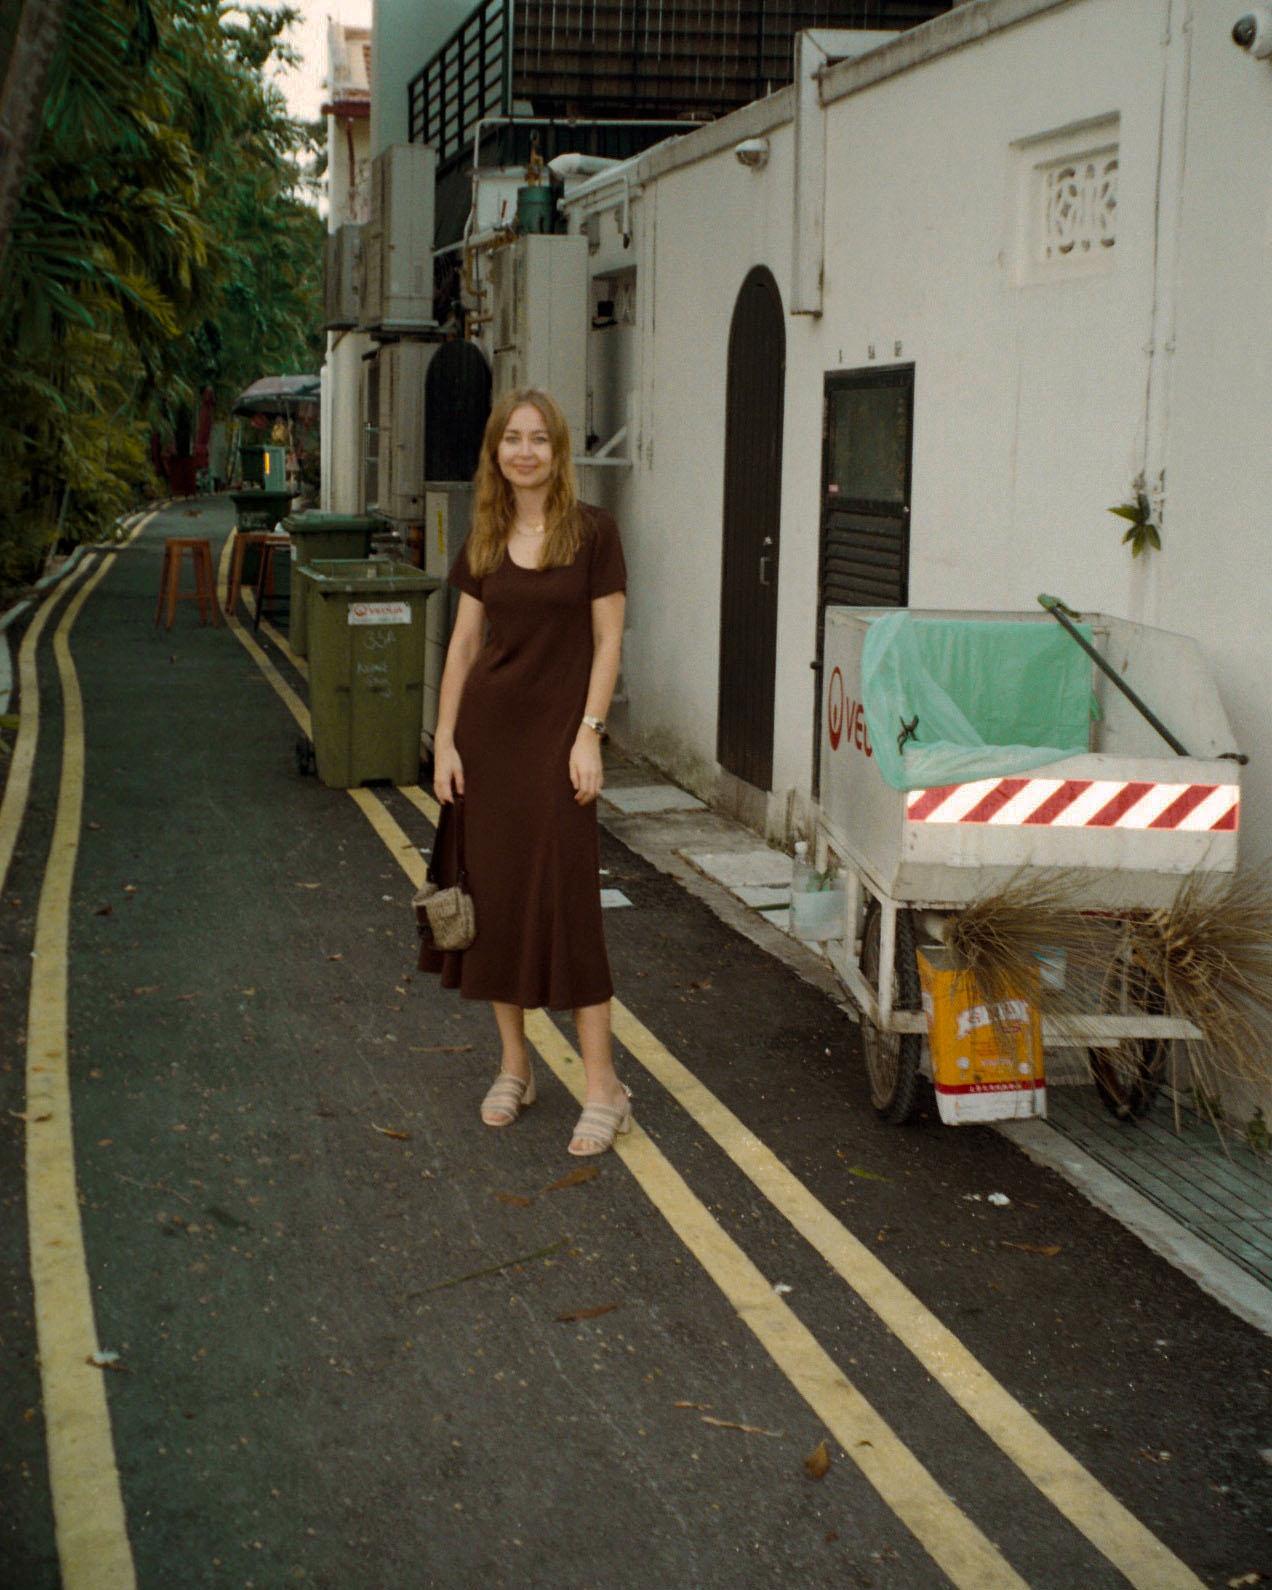 singapore 35mm 21.jpg